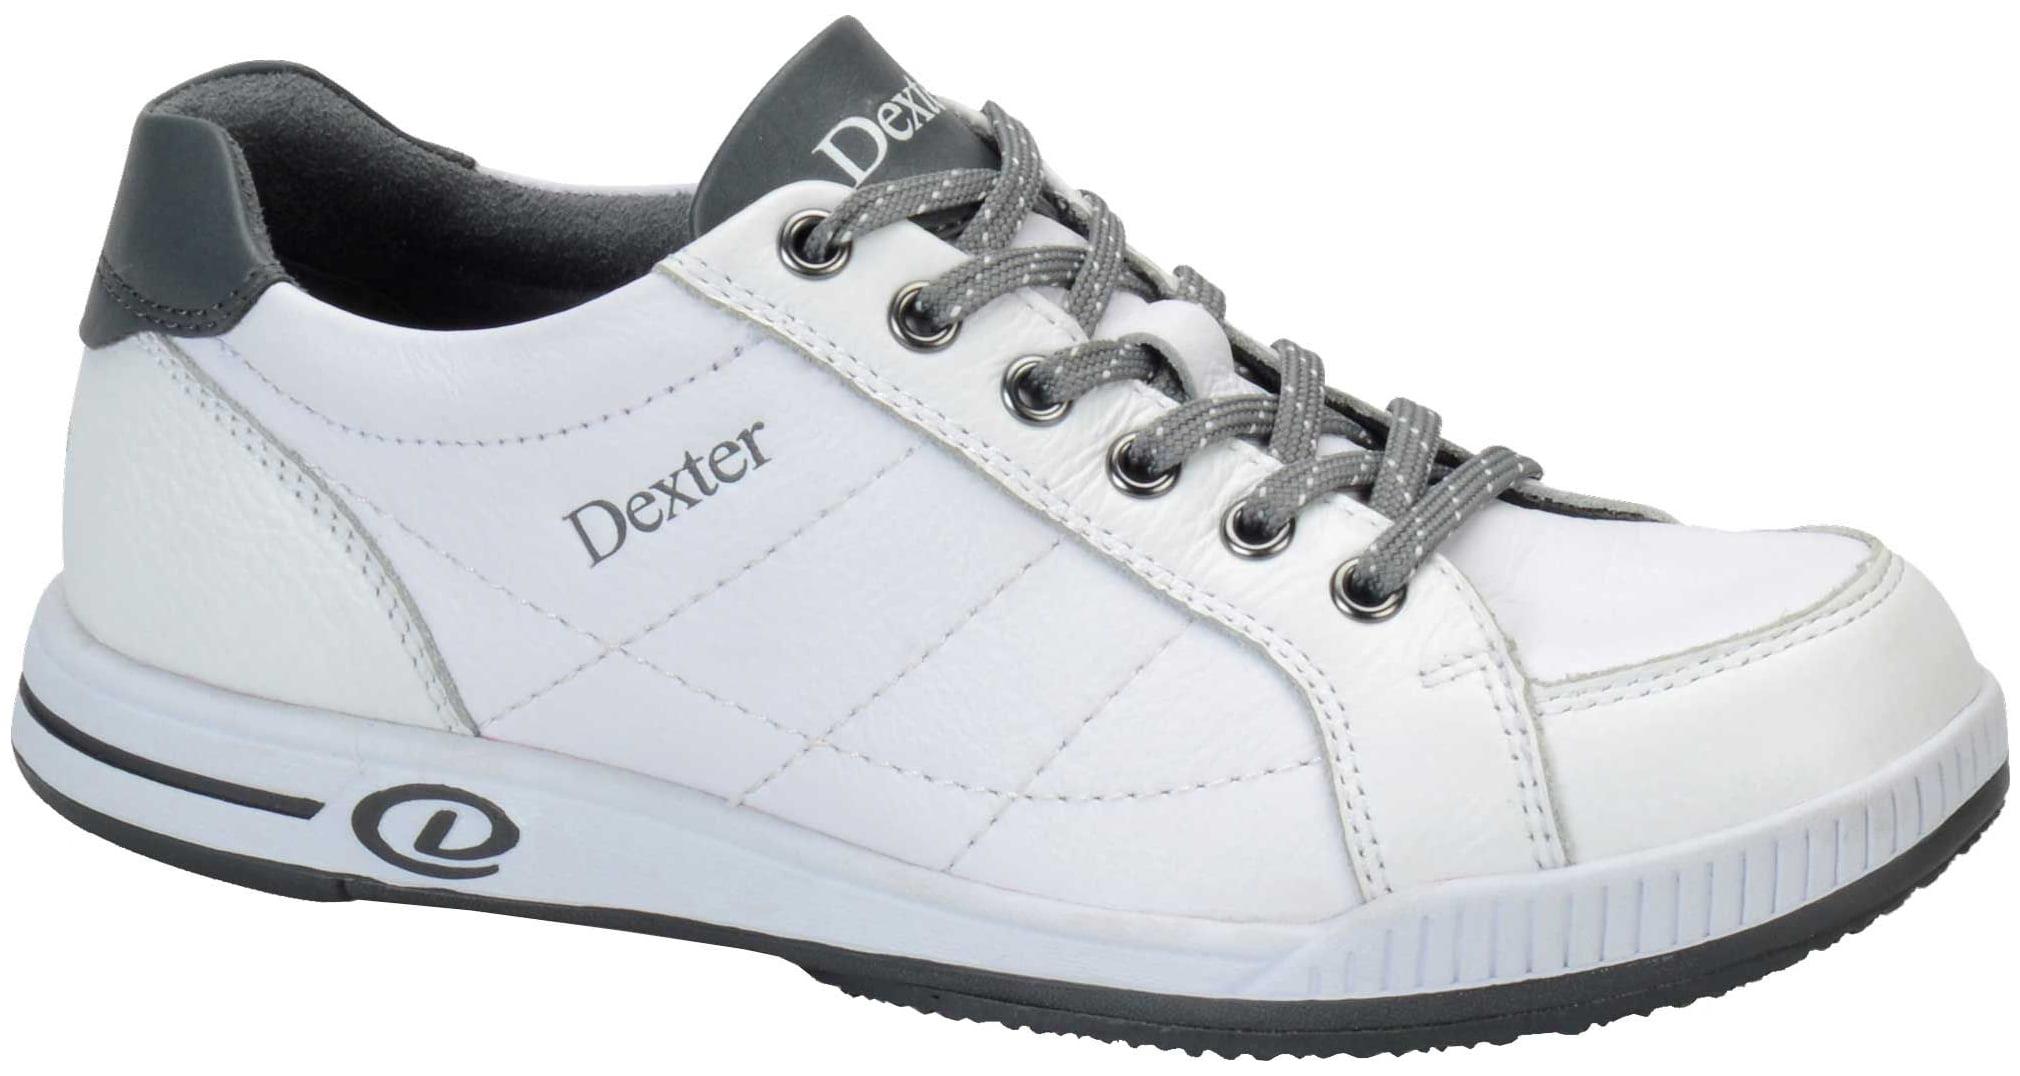 Dexter Deanna White/Grey Women's Bowling Shoes, Size 10